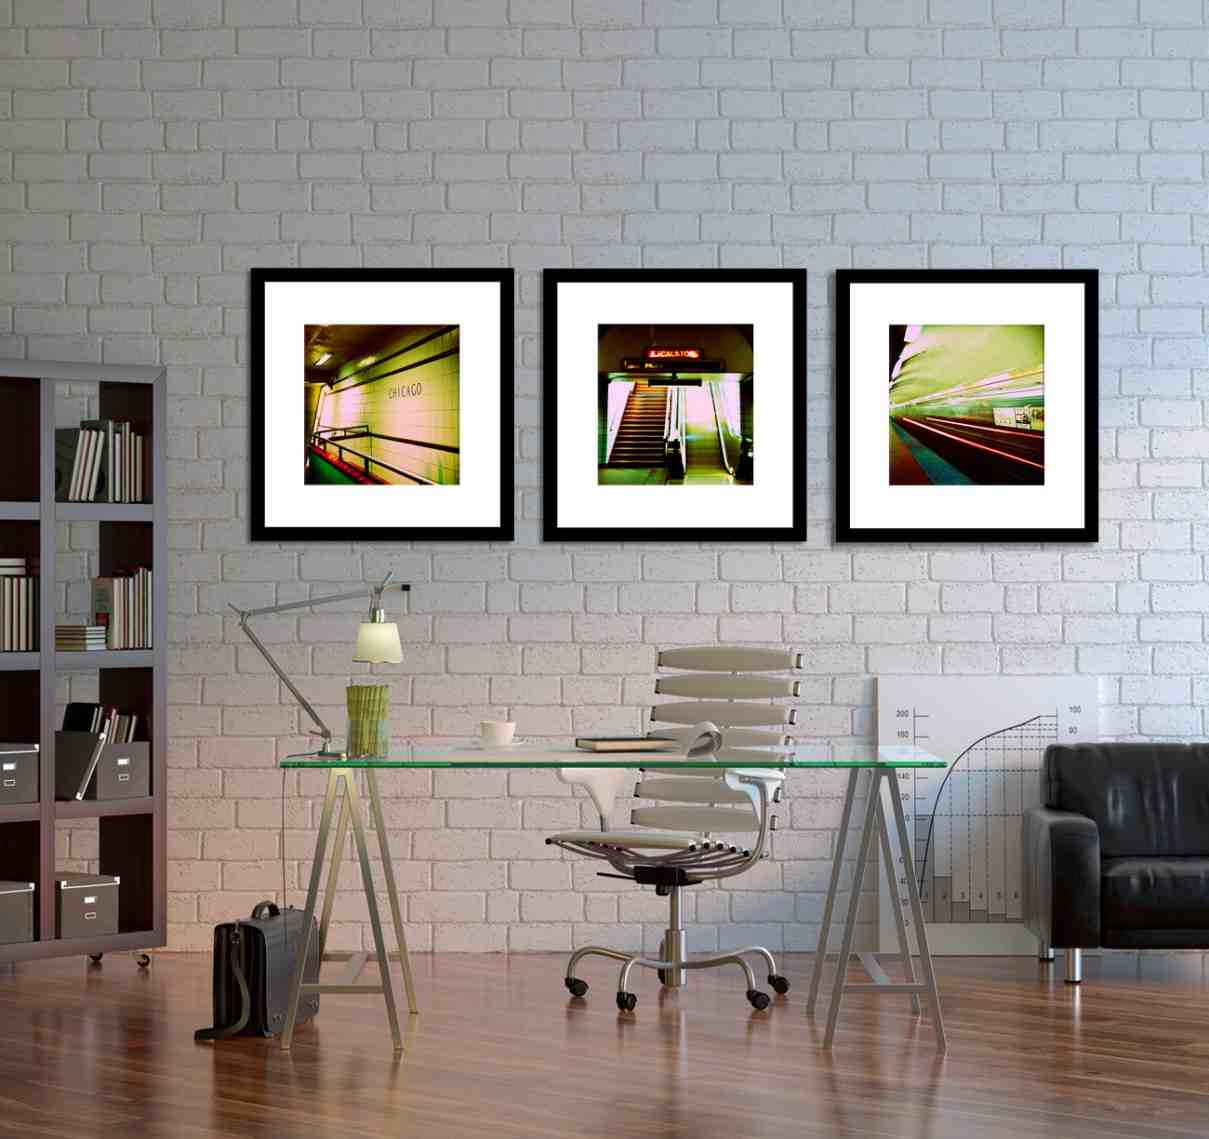 Office Decorating Ideas Pictures  Decor IdeasDecor Ideas